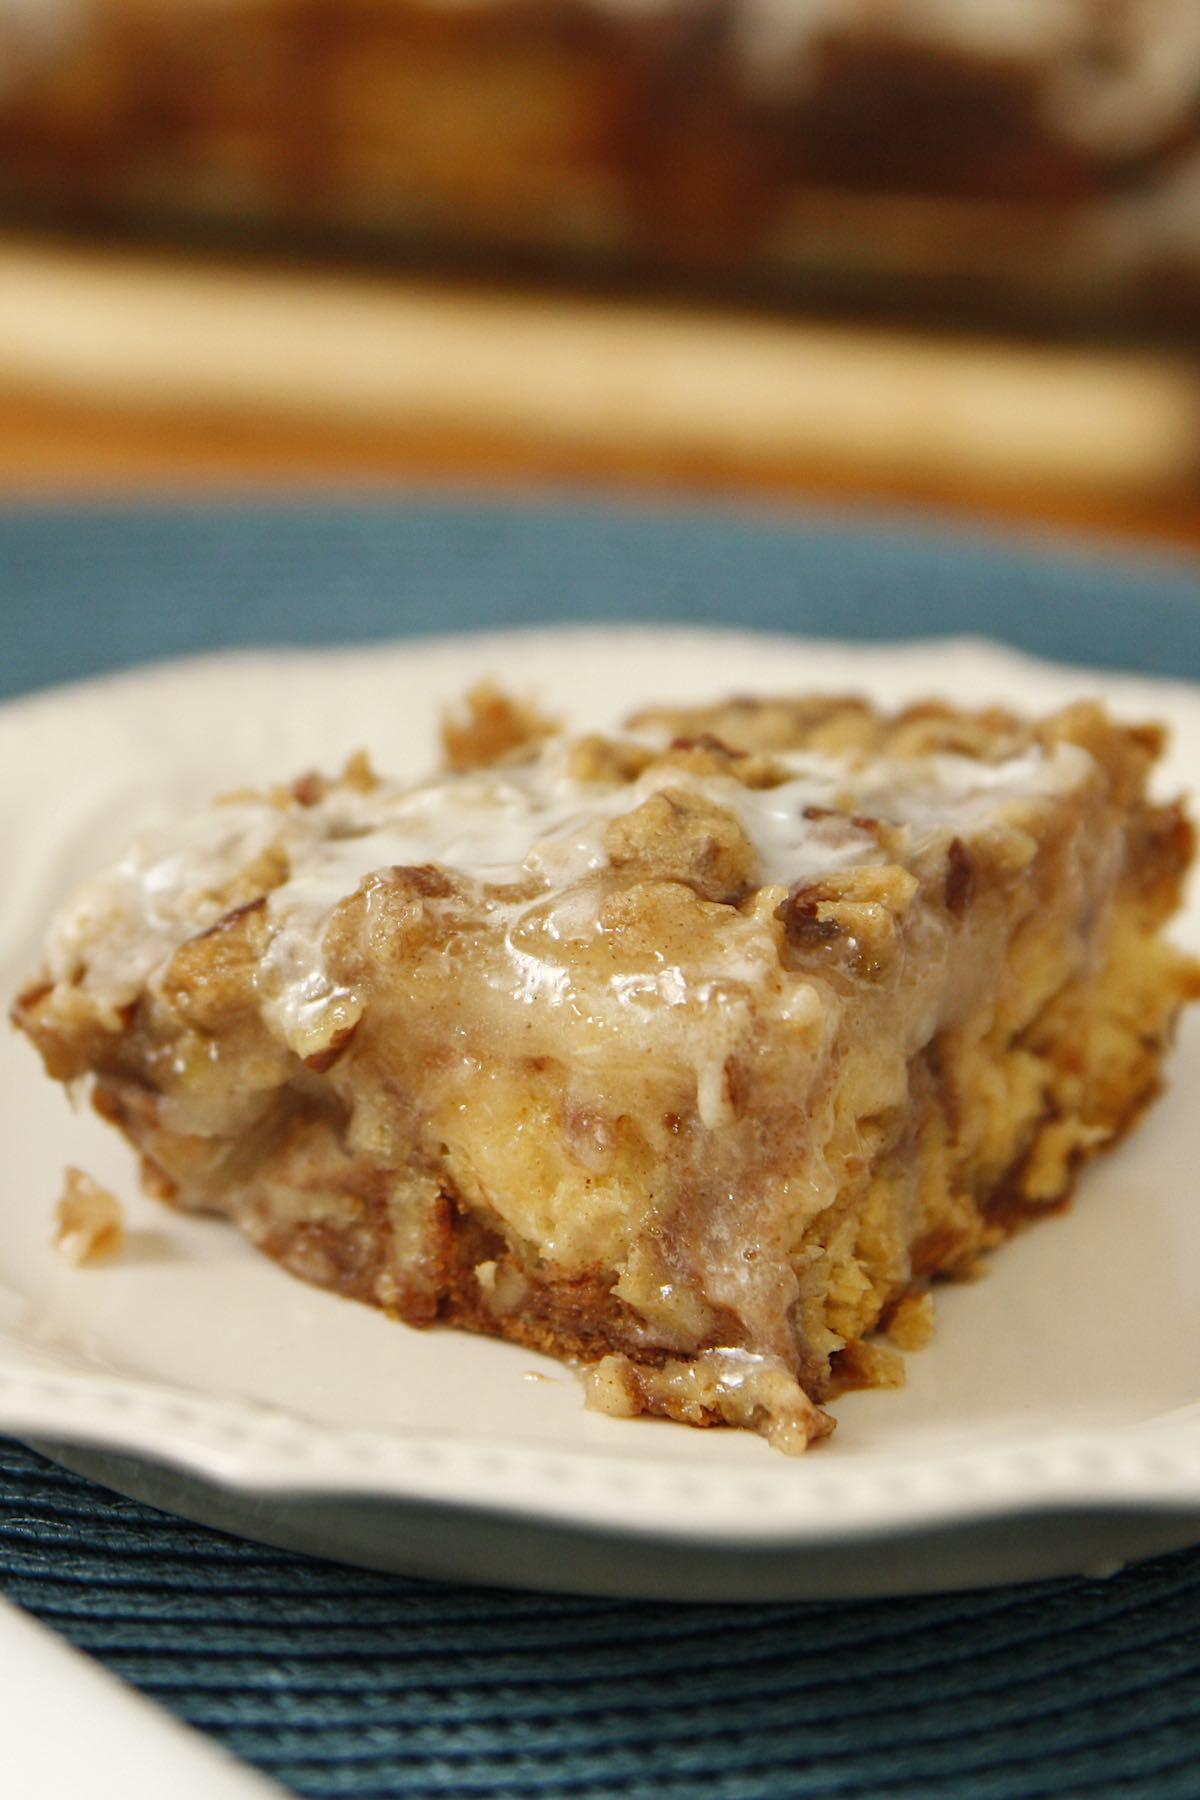 Freshly made Cinnamon Roll Apple Bake on a serving plate